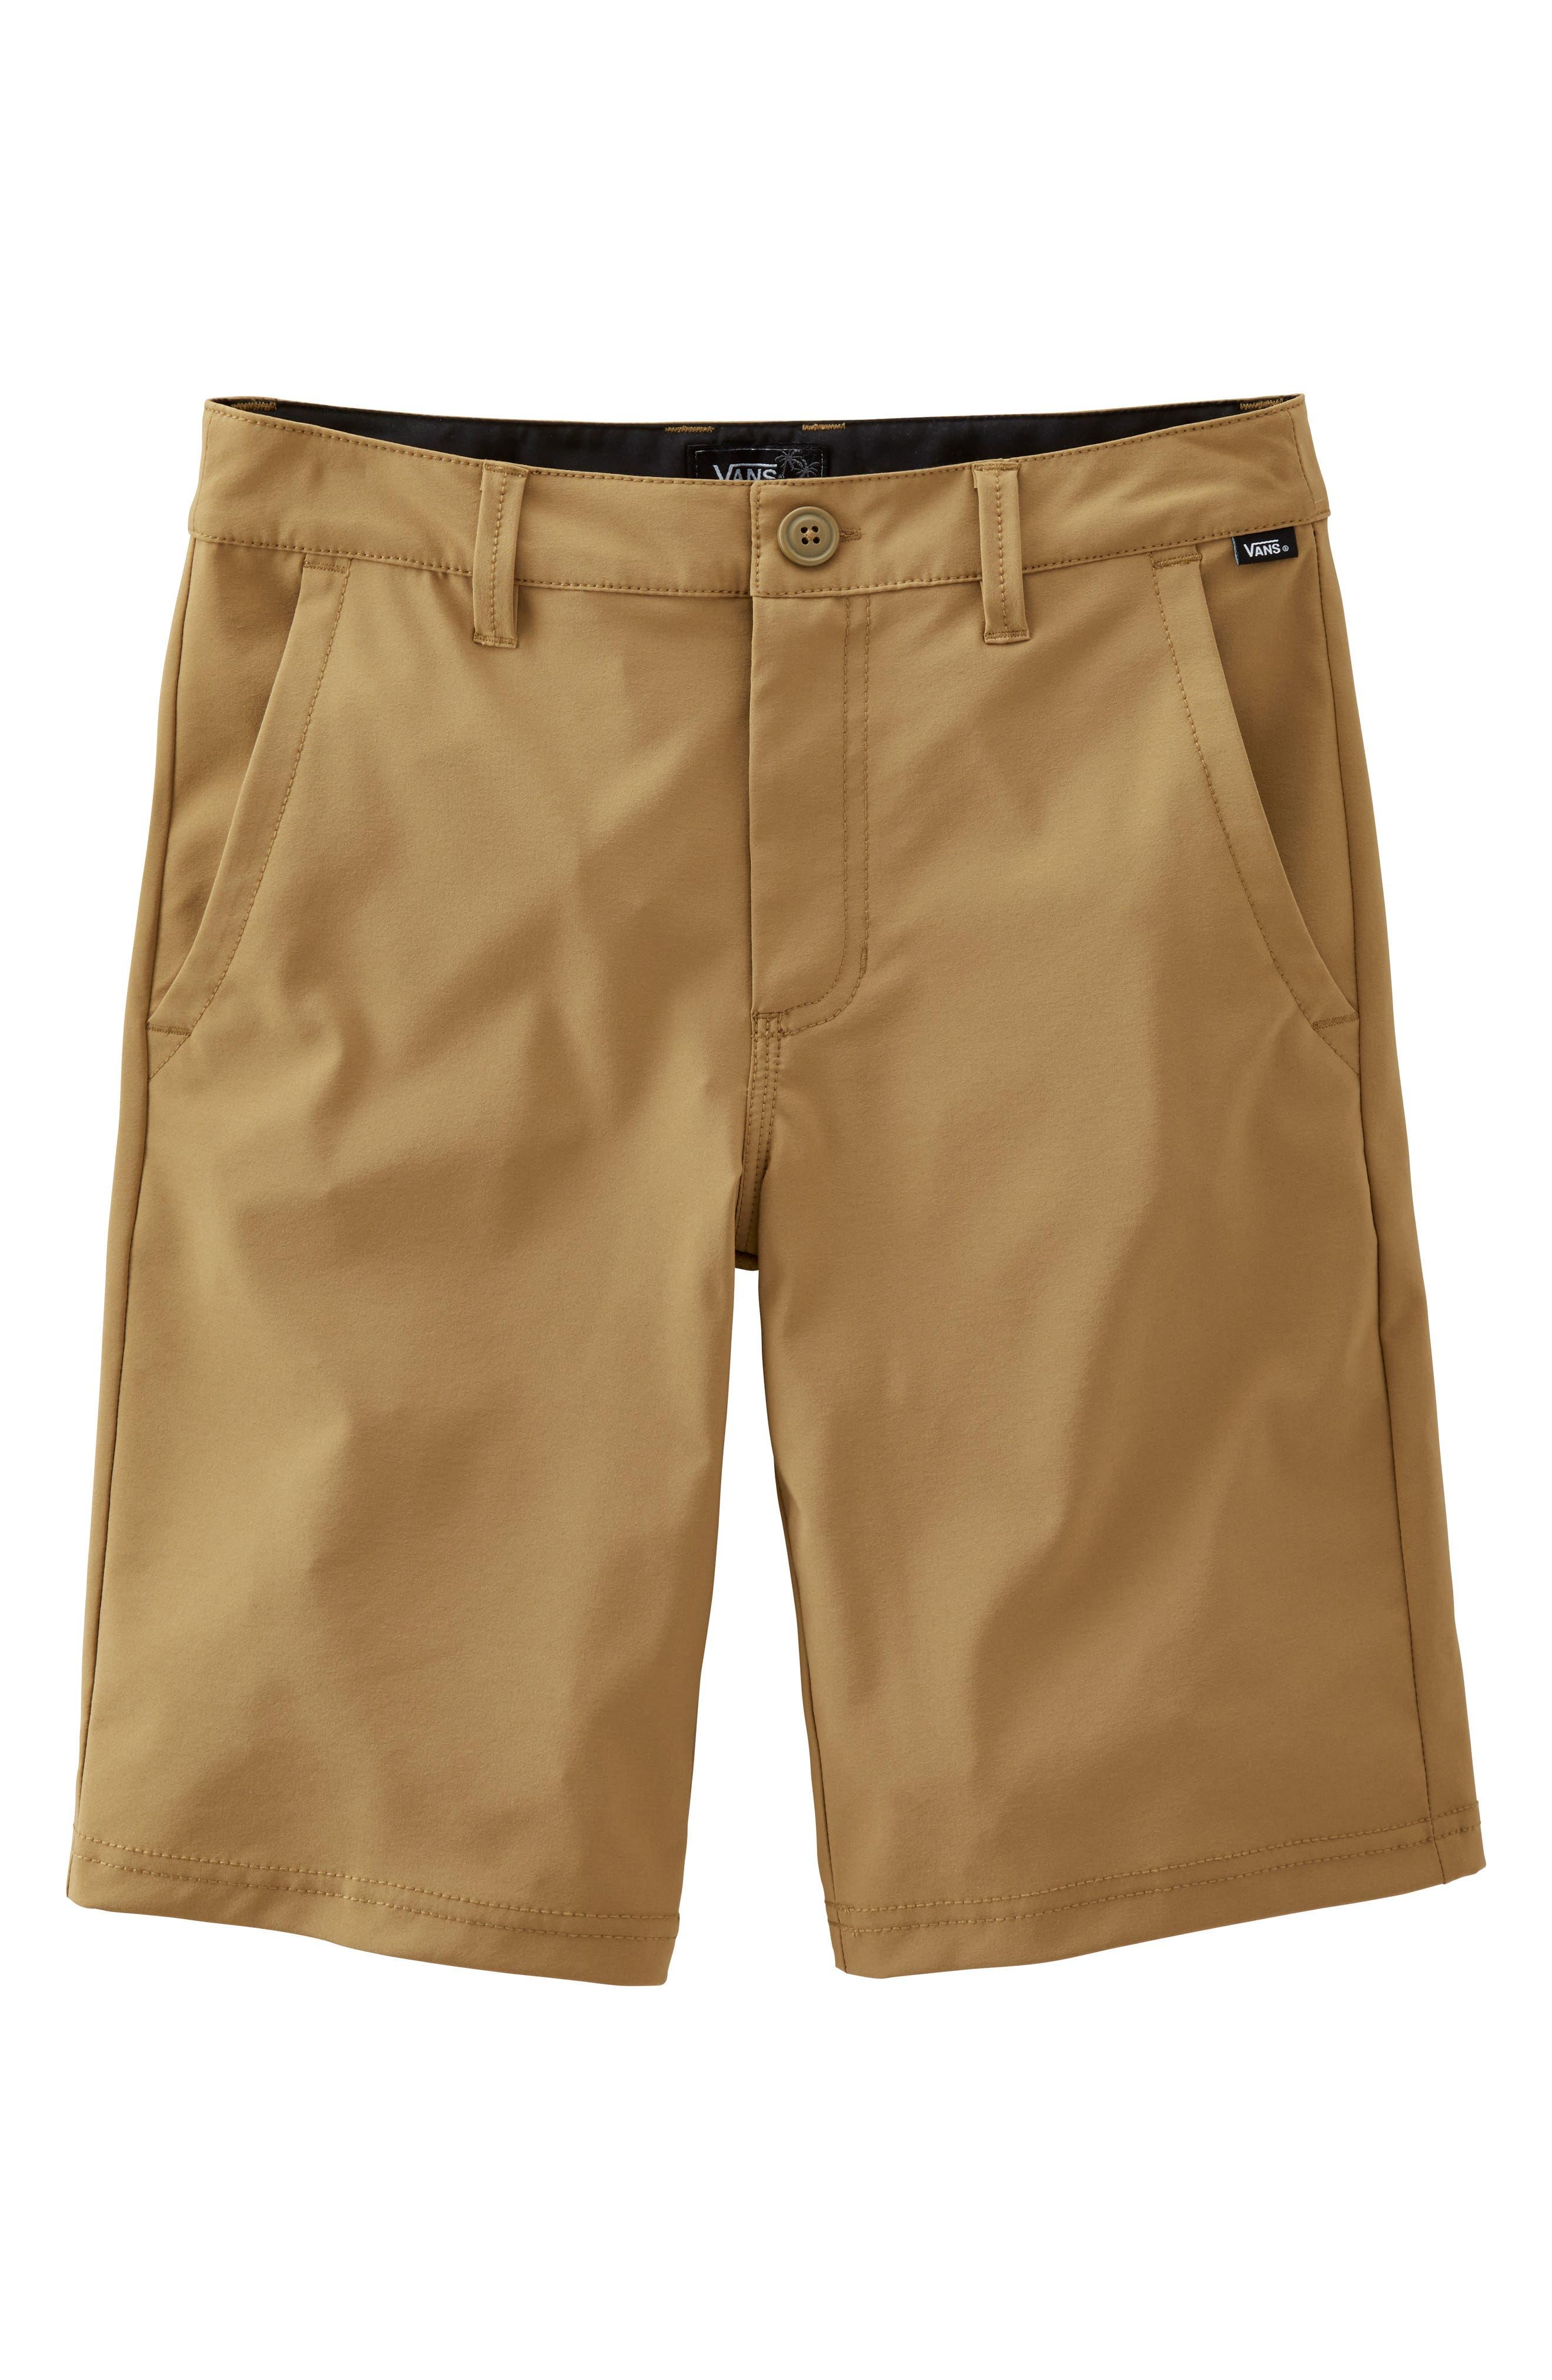 Authentic Decksider Hybrid Shorts,                             Main thumbnail 2, color,